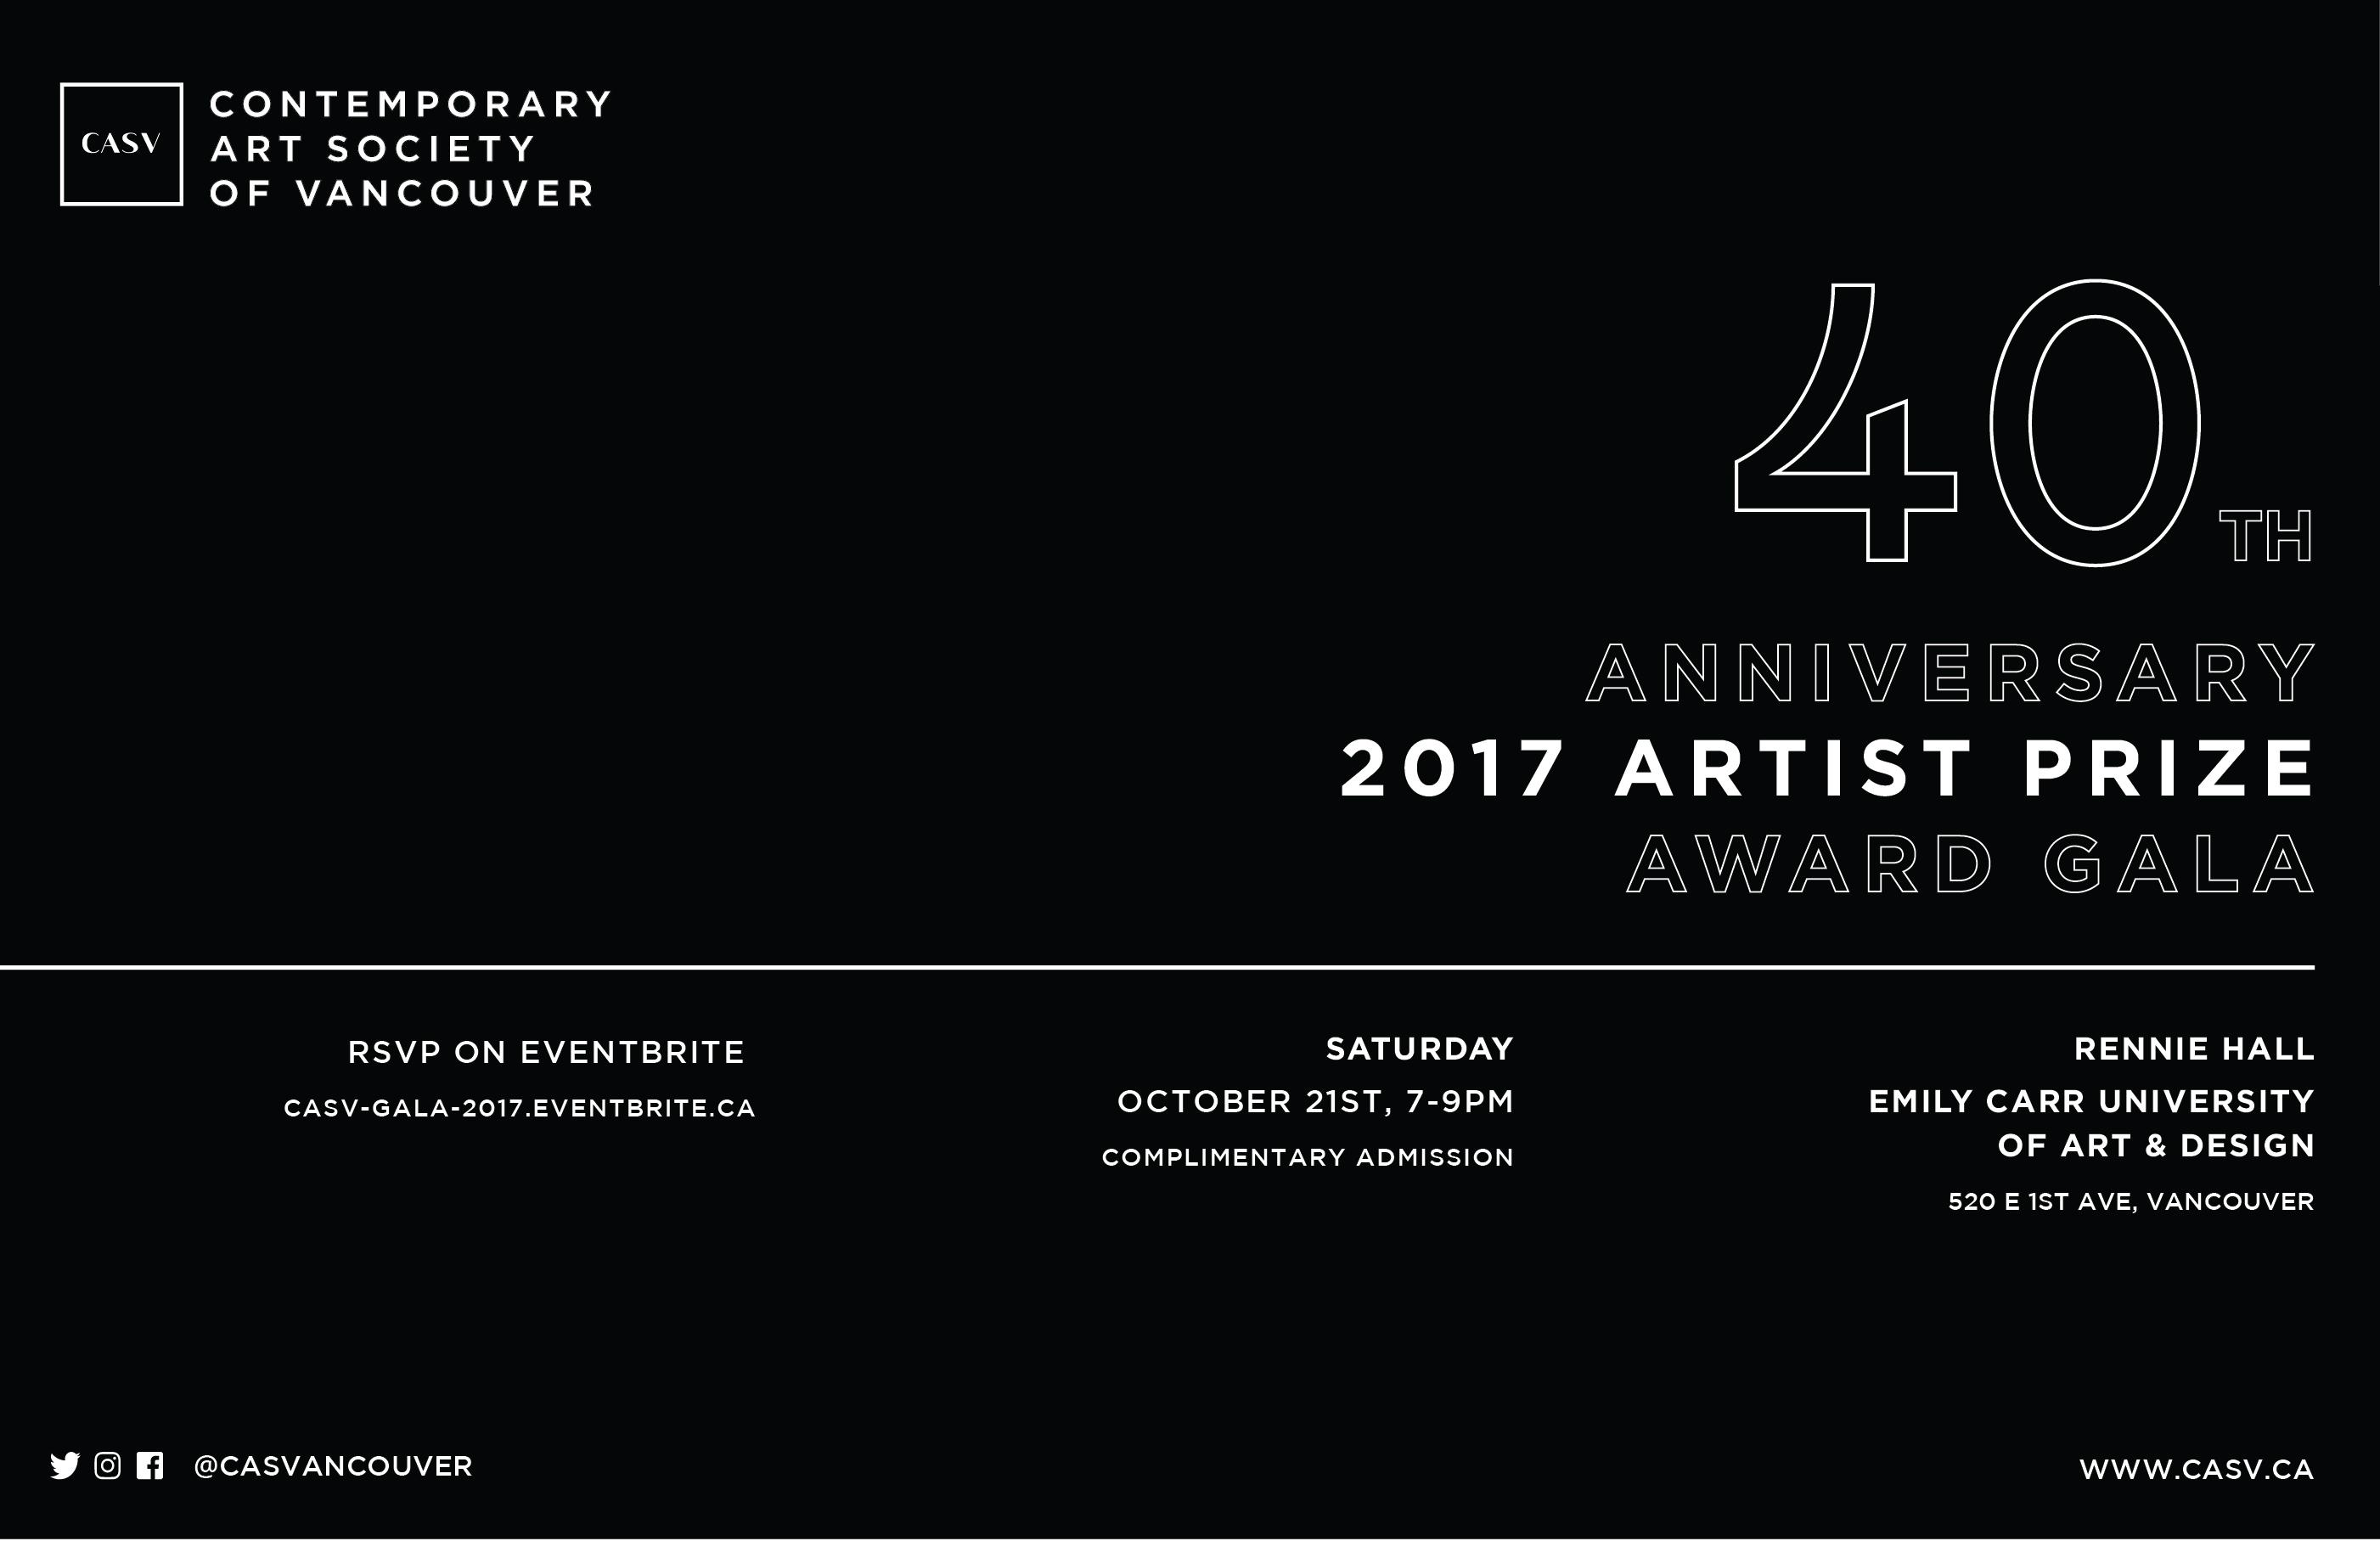 Contemporary Art Society of Vancouver 40th Anniversary Award Gala